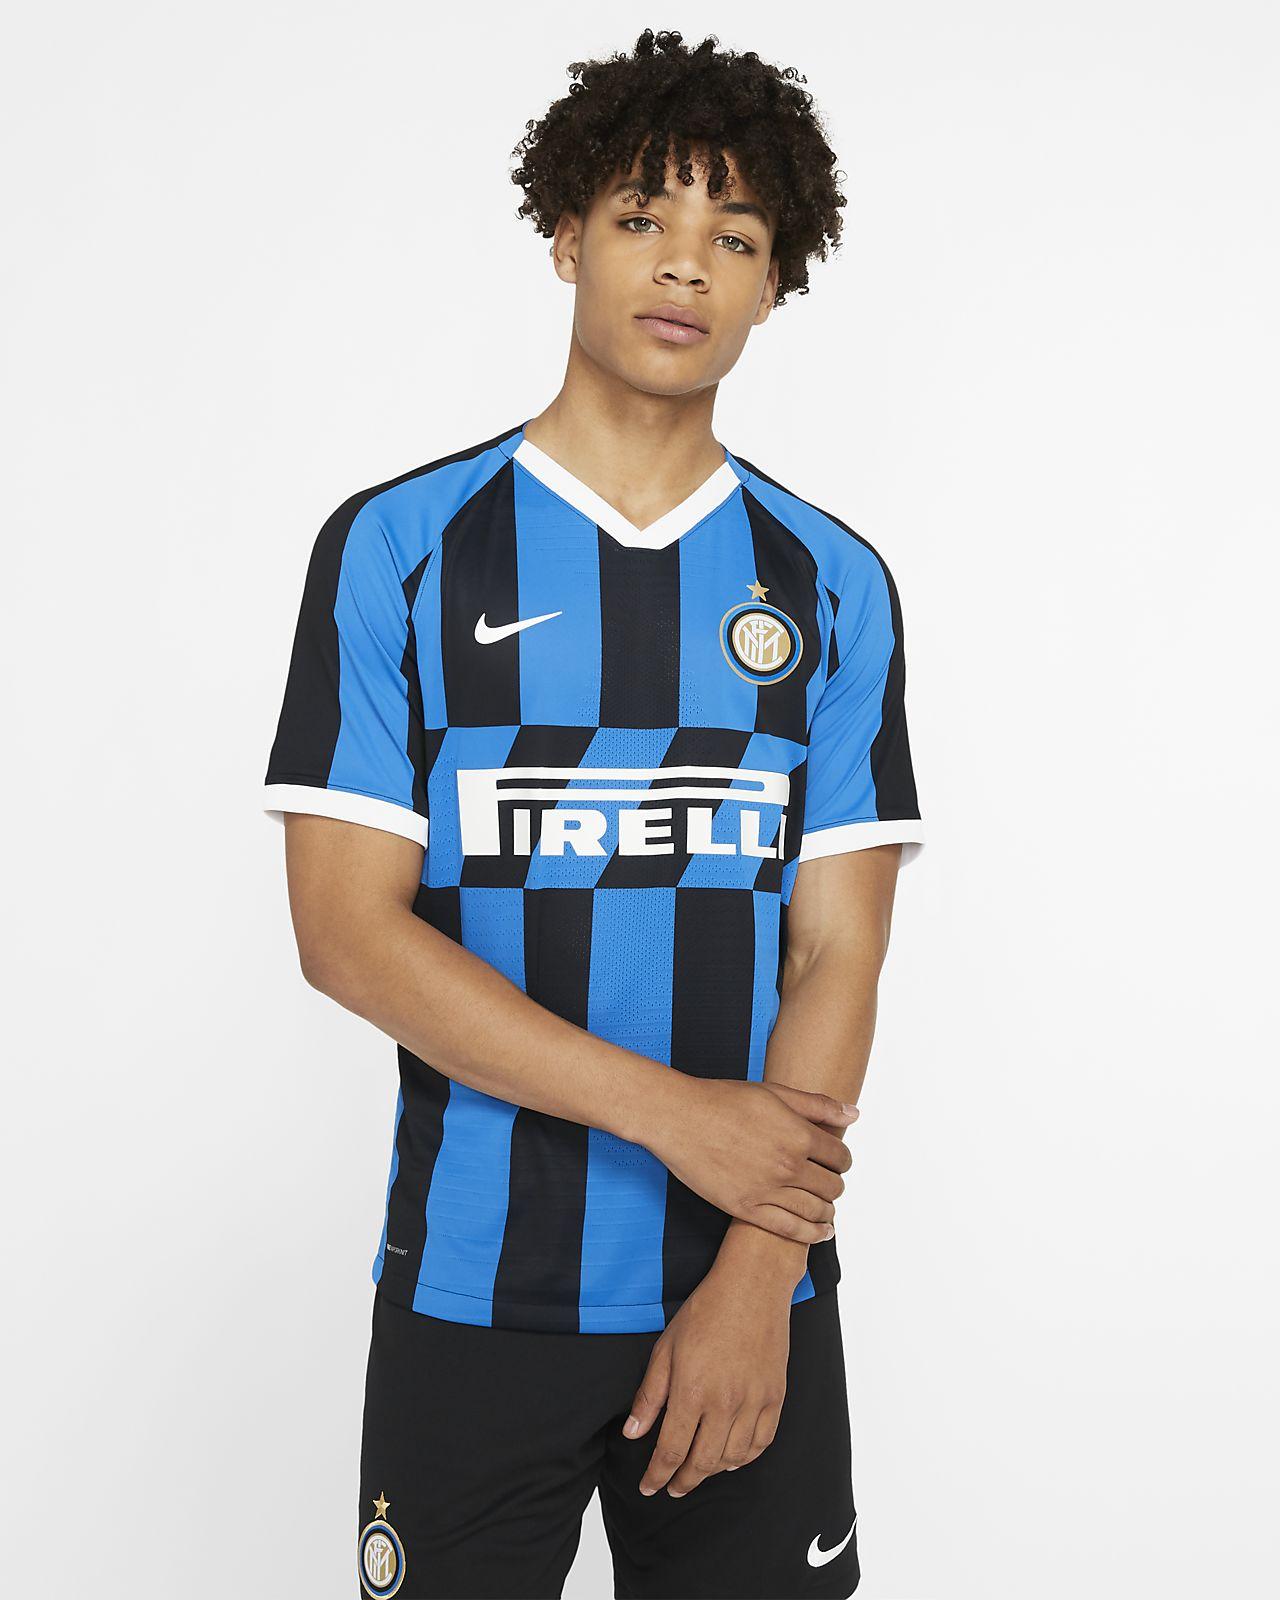 Camiseta de fútbol de local para hombre Vapor Match del Inter de Milán 2019/20